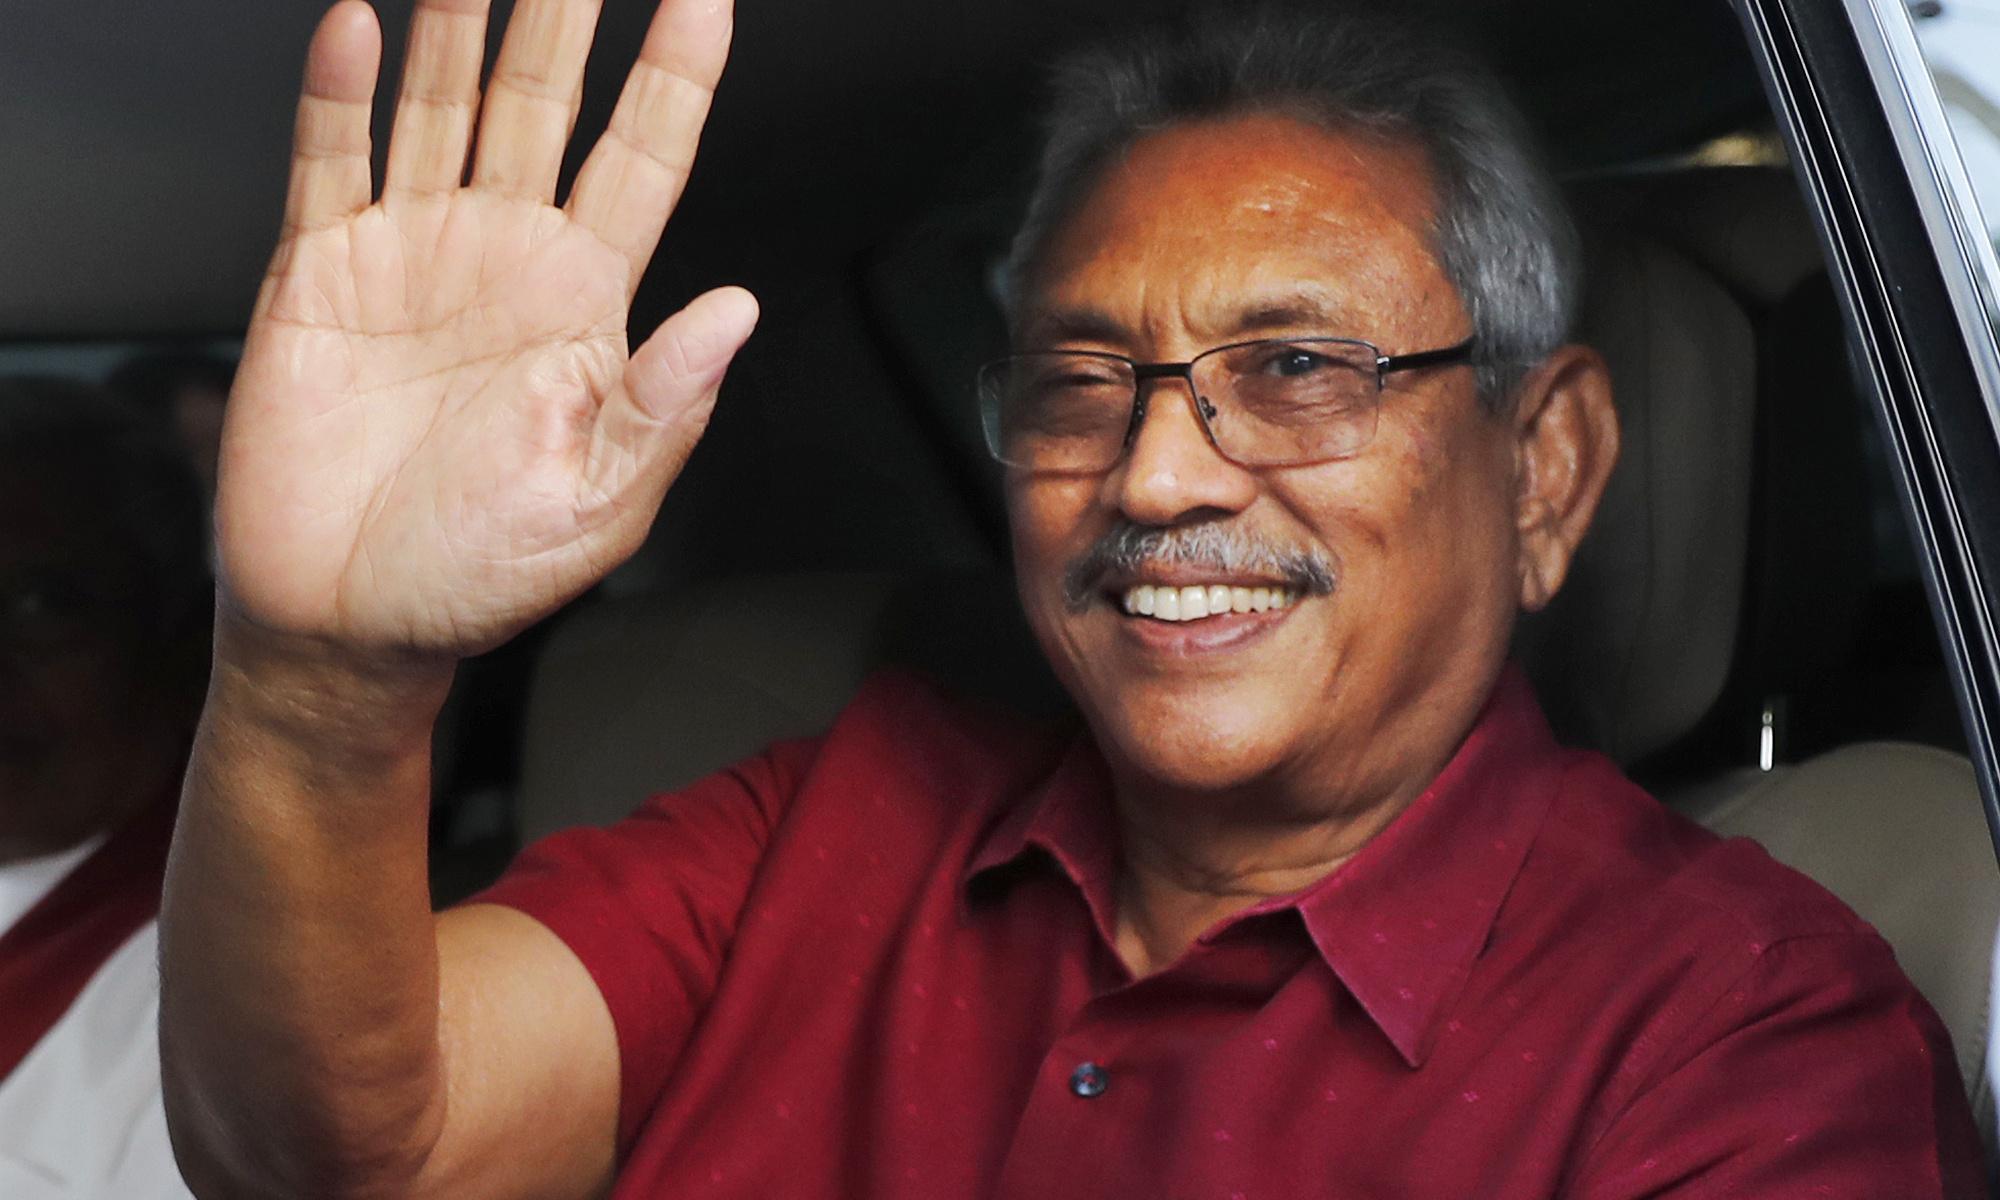 'The Terminator': how Gotabaya Rajapaksa's ruthless streak led him to power